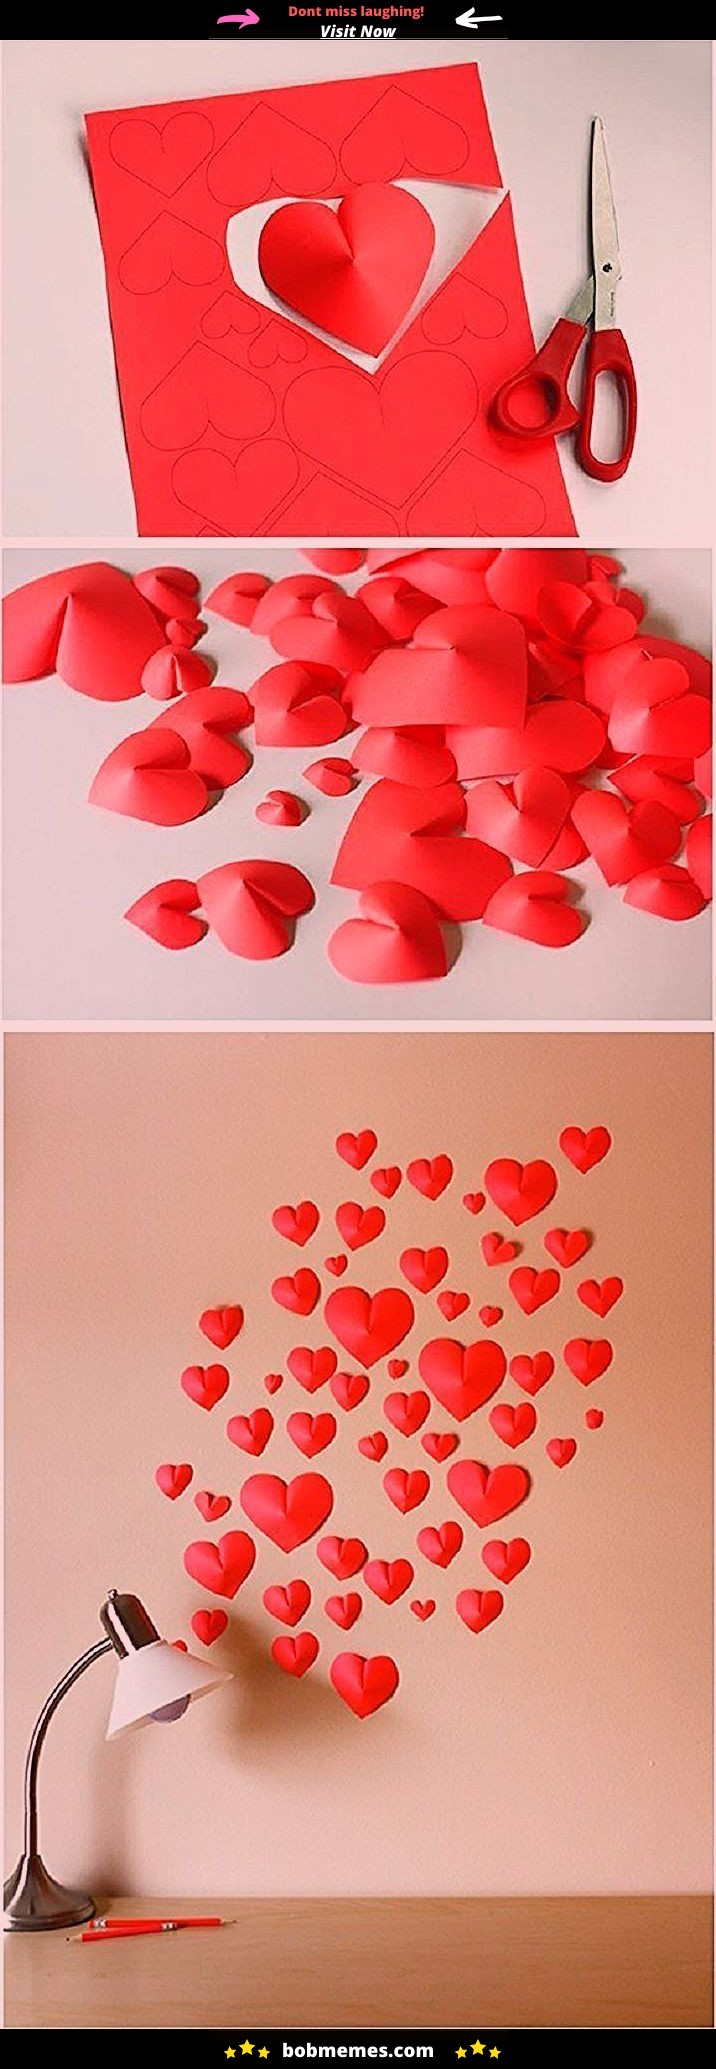 18 Valentines Day Memes Humor 3